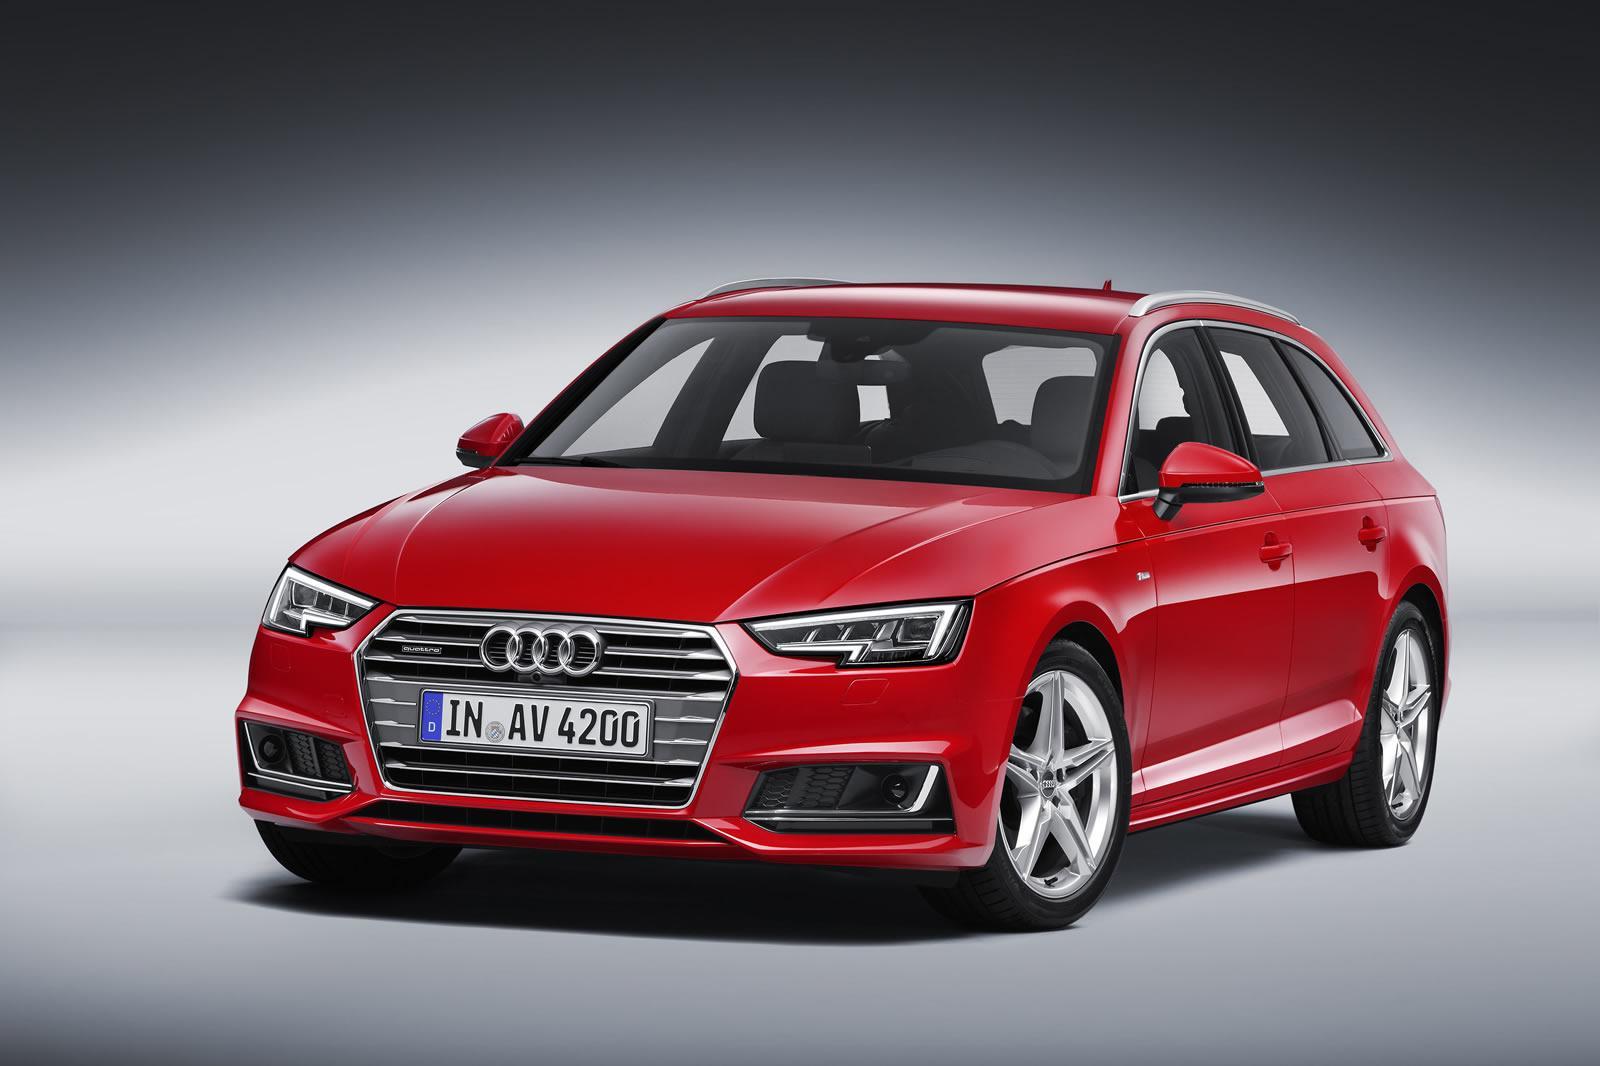 2016 Audi A4 Avant (B9) Photos, Videos and Details ...